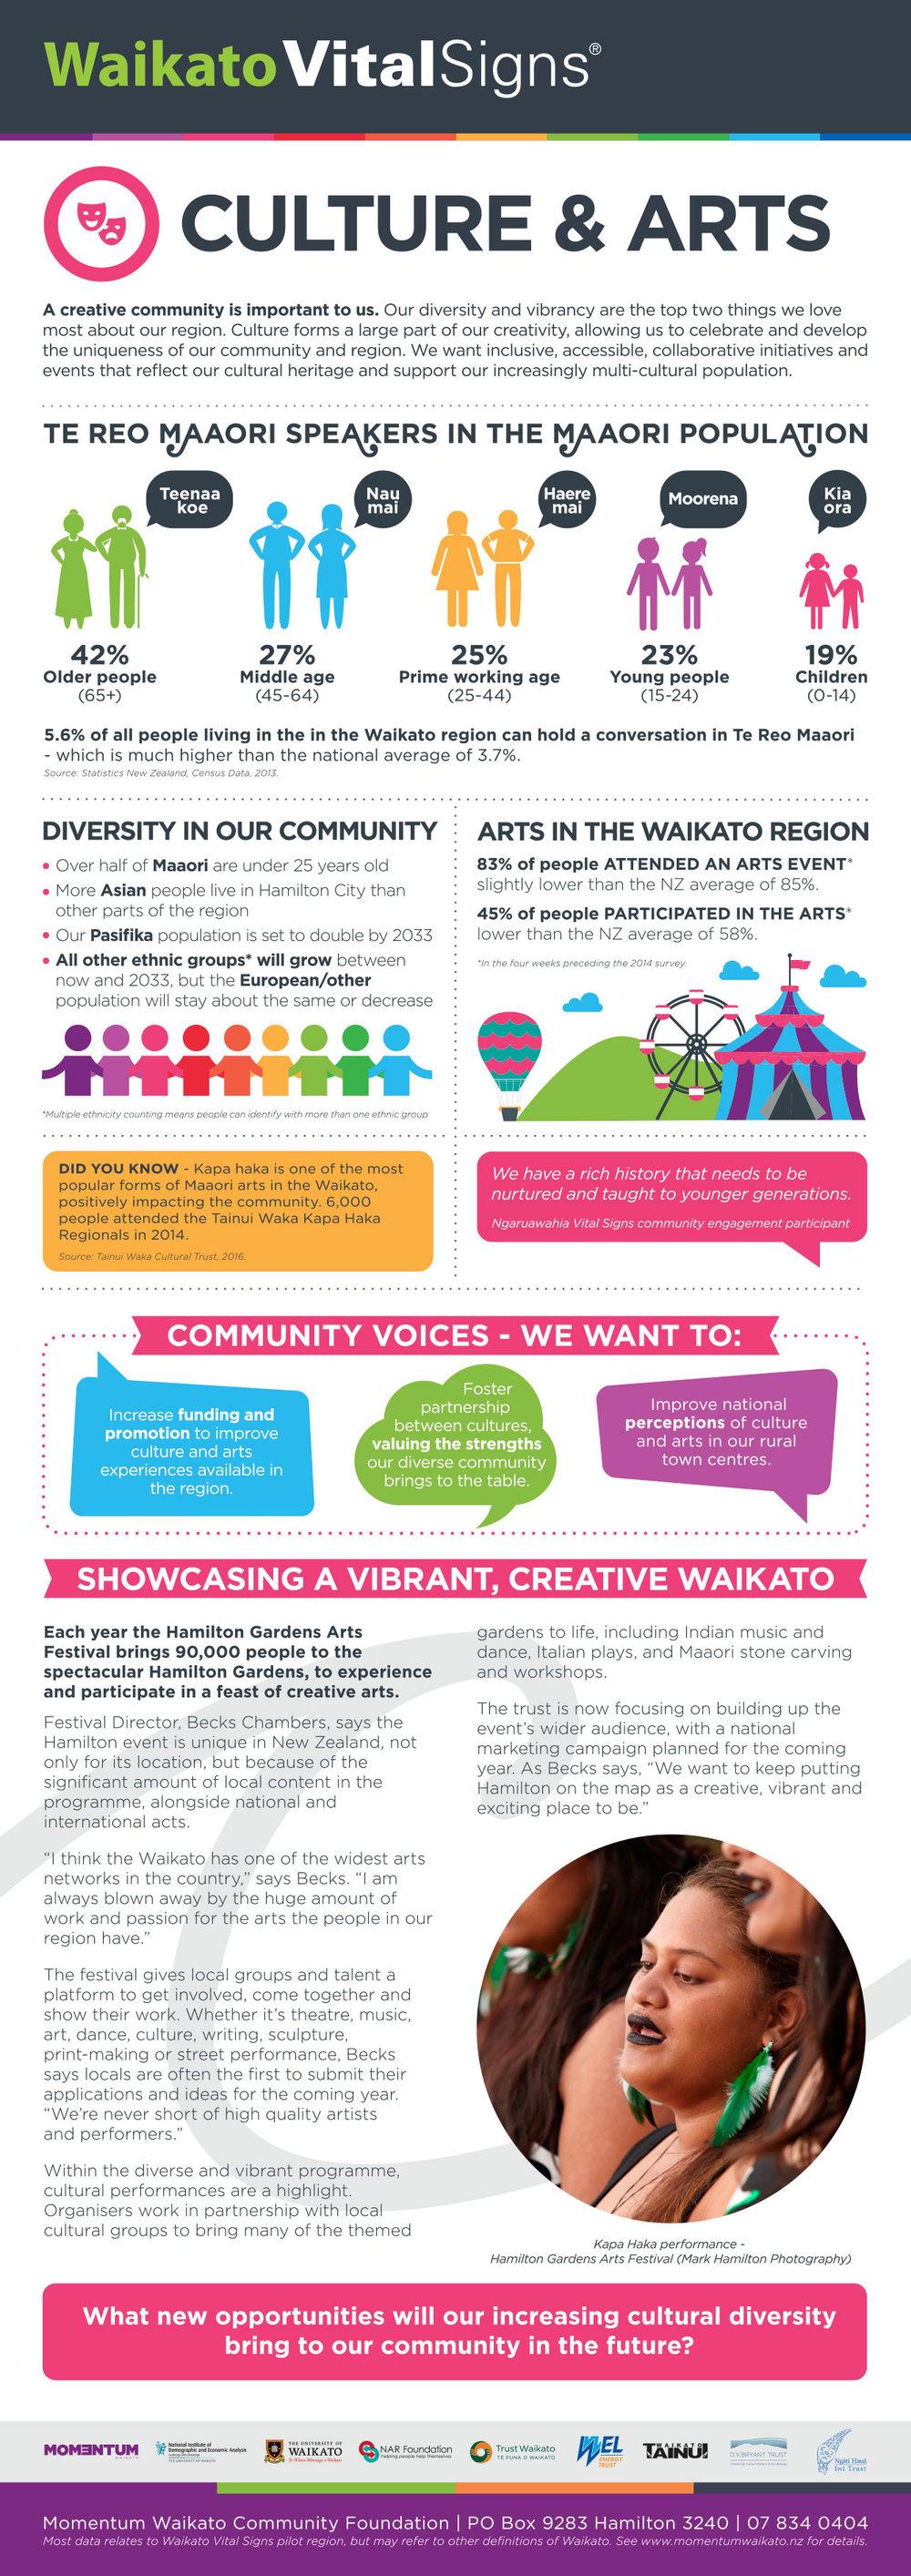 WVS_Culture_Arts_Panel.jpg